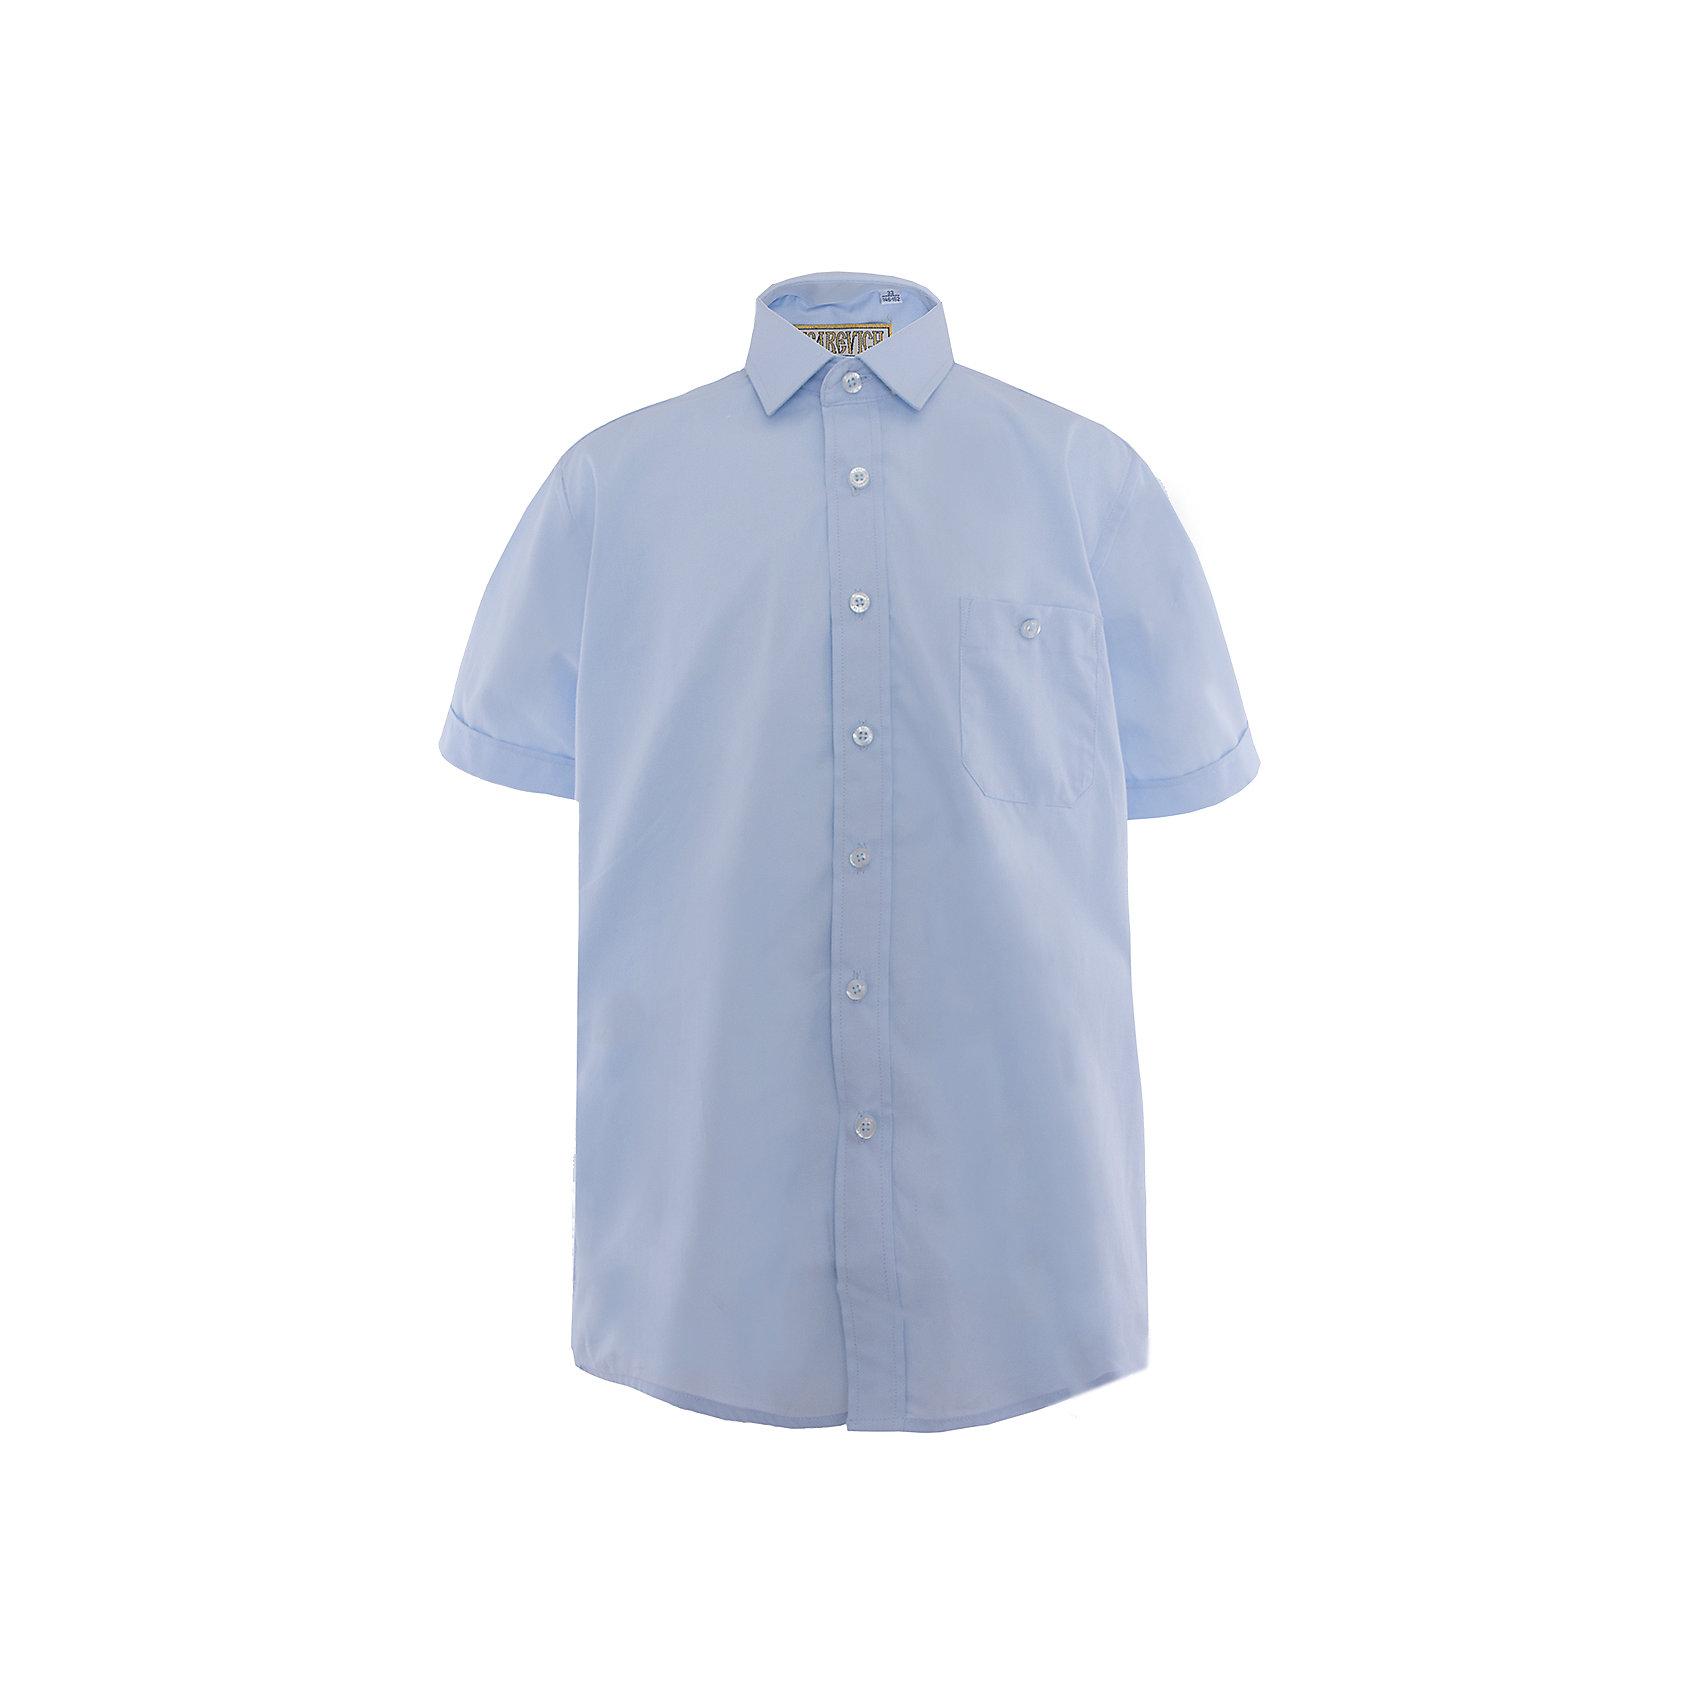 Рубашка для мальчика  TsarevichРубашка для мальчика от российской марки Tsarevich.<br>Состав:<br>80% хлопок  20% полиэстер<br><br>Ширина мм: 174<br>Глубина мм: 10<br>Высота мм: 169<br>Вес г: 157<br>Цвет: голубой<br>Возраст от месяцев: 144<br>Возраст до месяцев: 156<br>Пол: Мужской<br>Возраст: Детский<br>Размер: 152/158,146/152,134/140,122/128,140/146,128/134,164/170,158/164<br>SKU: 4163619